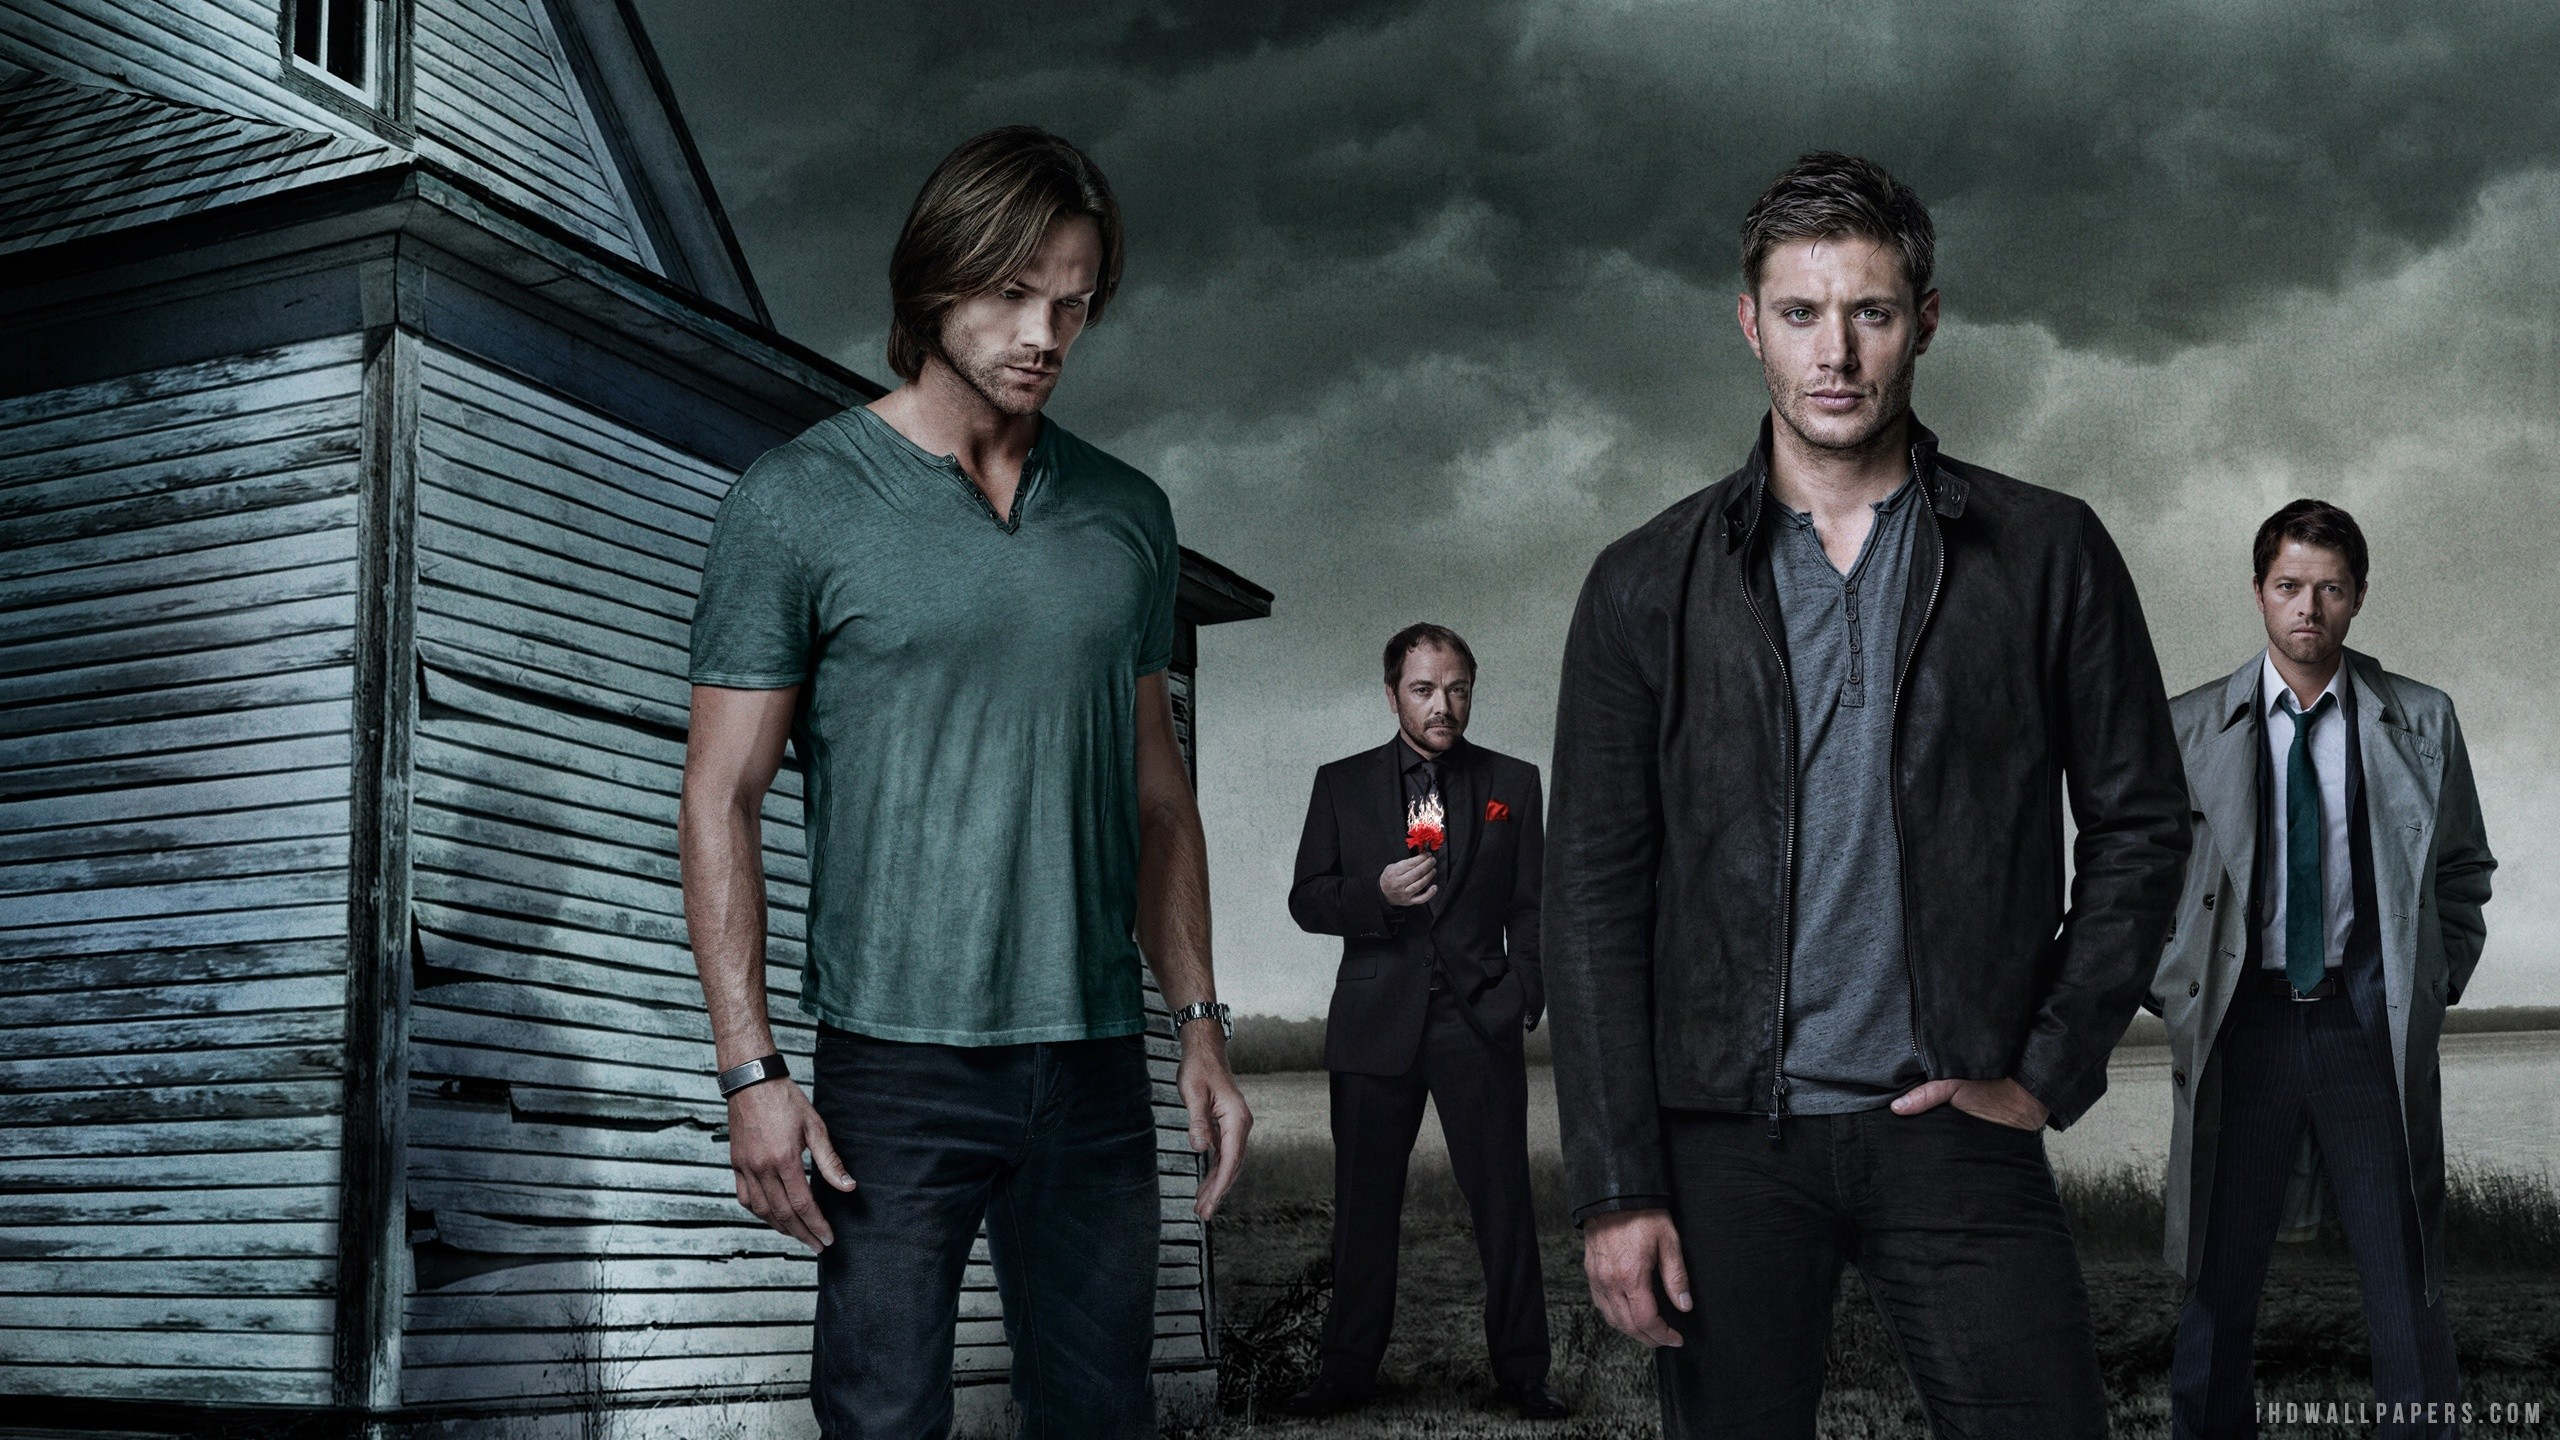 CW <b>Supernatural Wallpaper</b>, PC, Laptop 45 CW